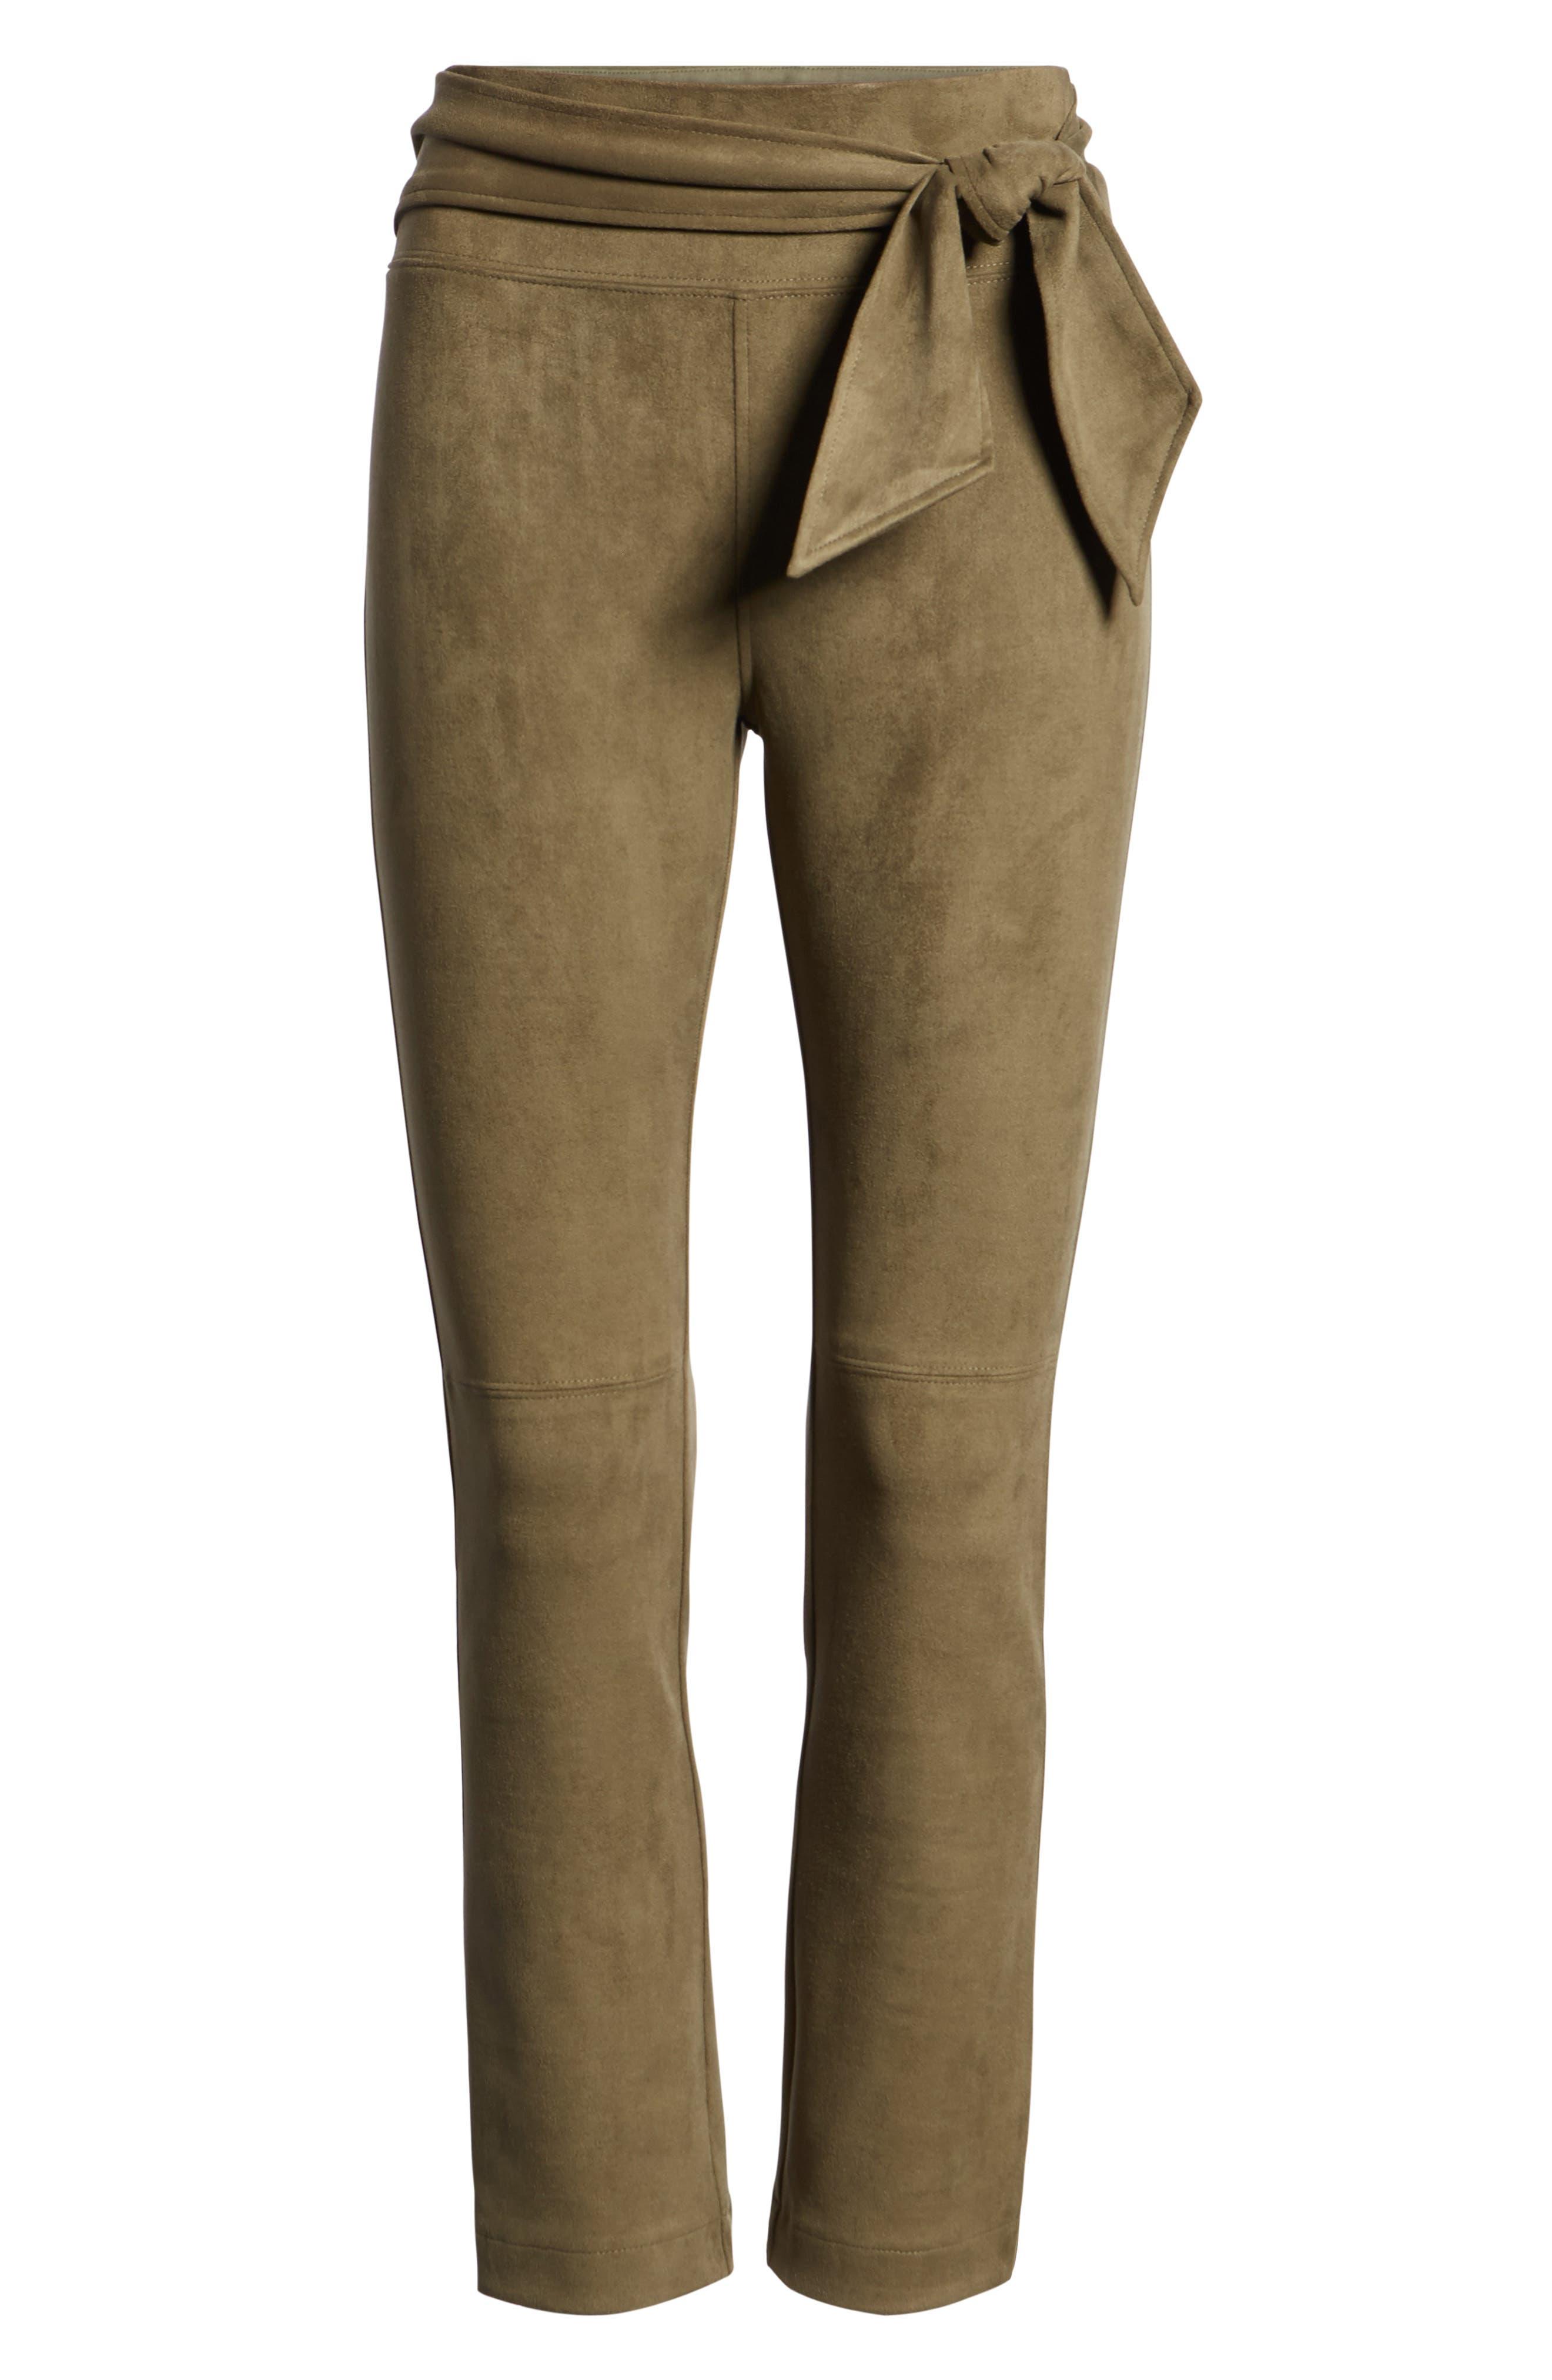 DAVID LERNER,                             Waist Tie Skimmer Leggings,                             Alternate thumbnail 6, color,                             ARMY GREEN